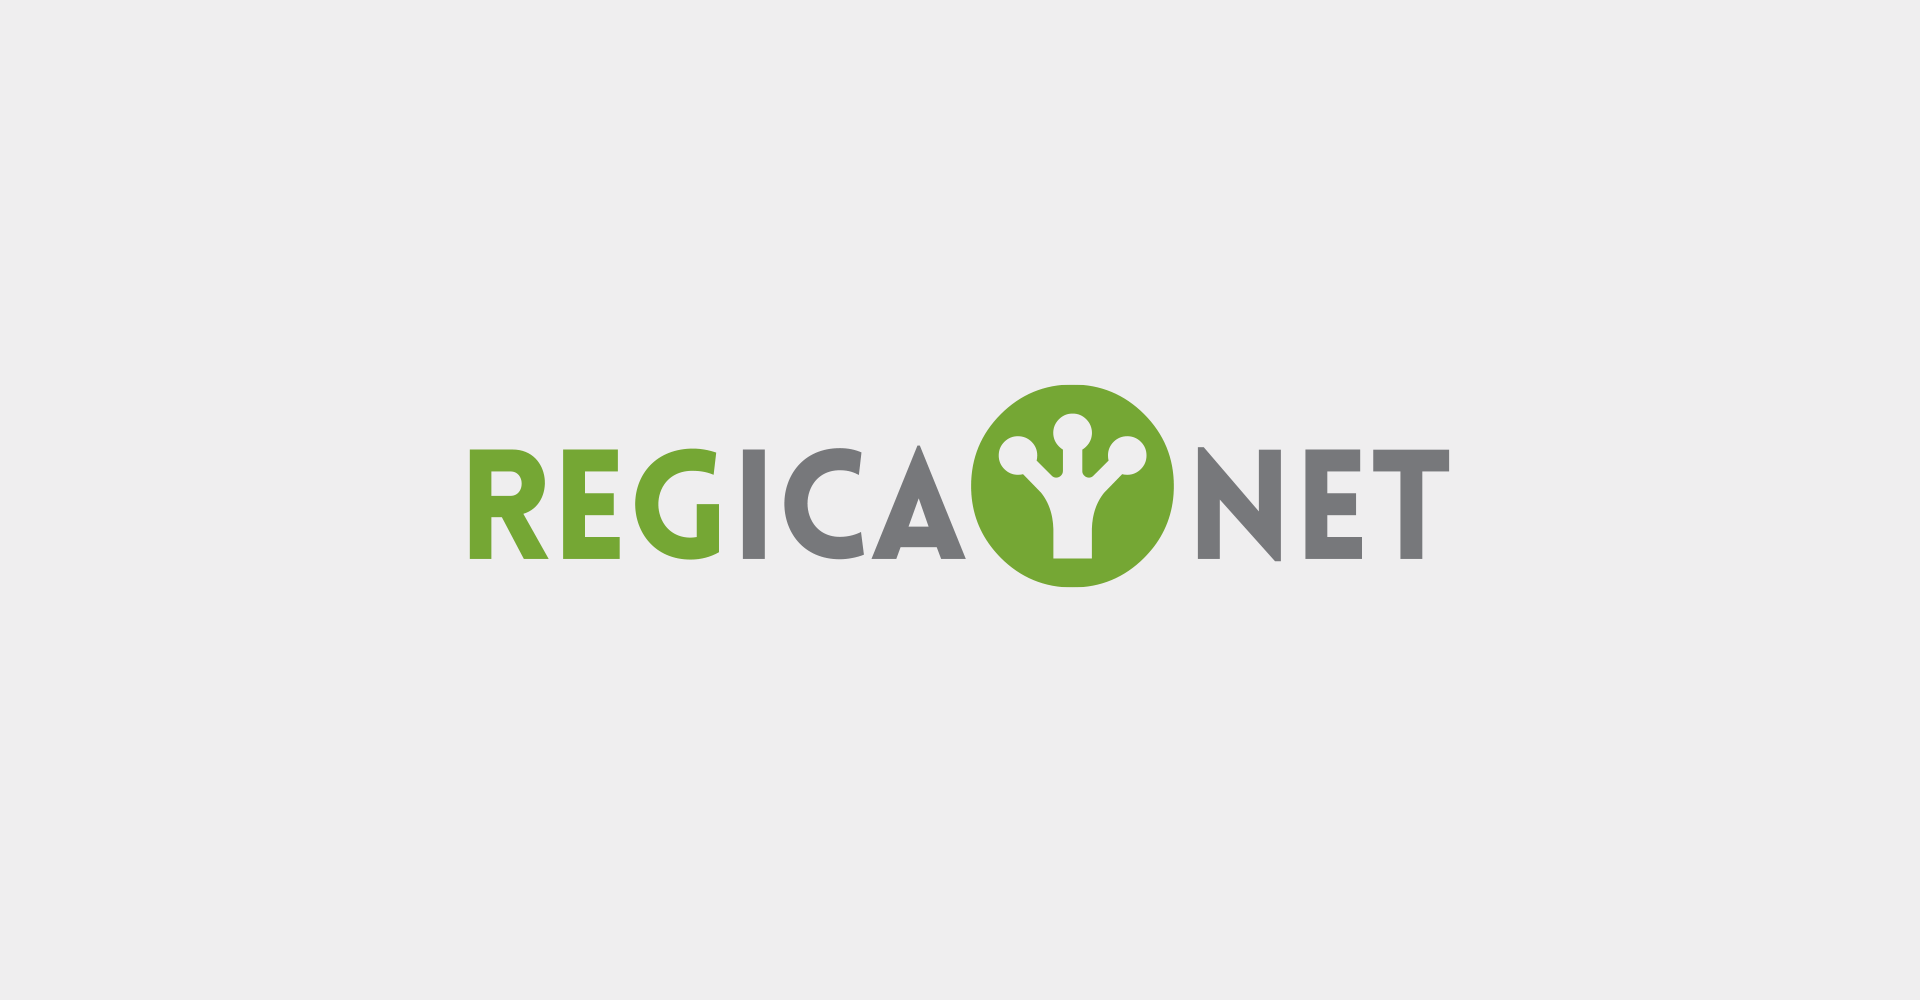 Regica.NET